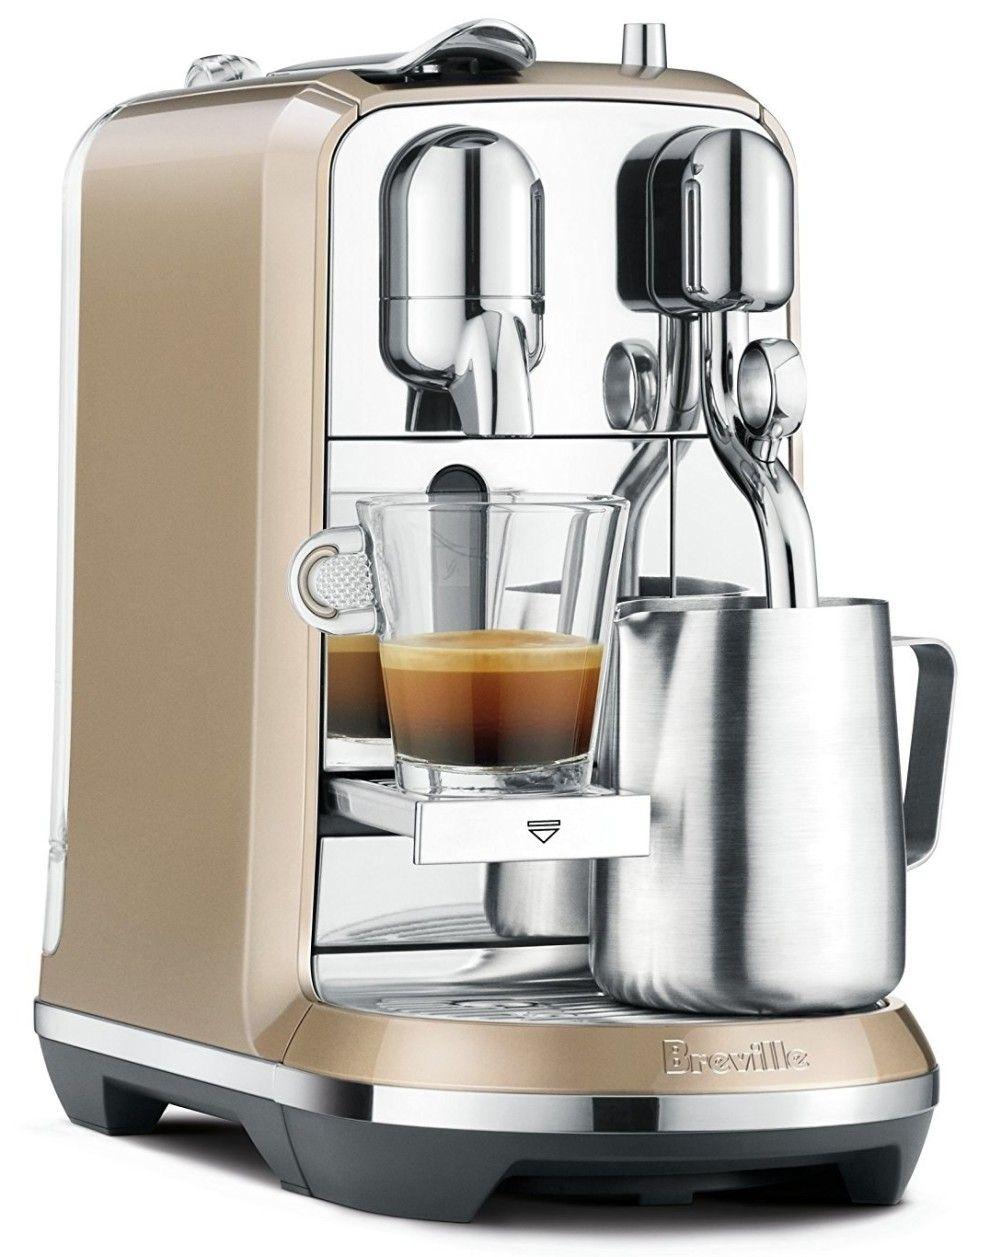 The Best Cyber Monday Deals On Amazon Nespresso Espresso Espresso Machine